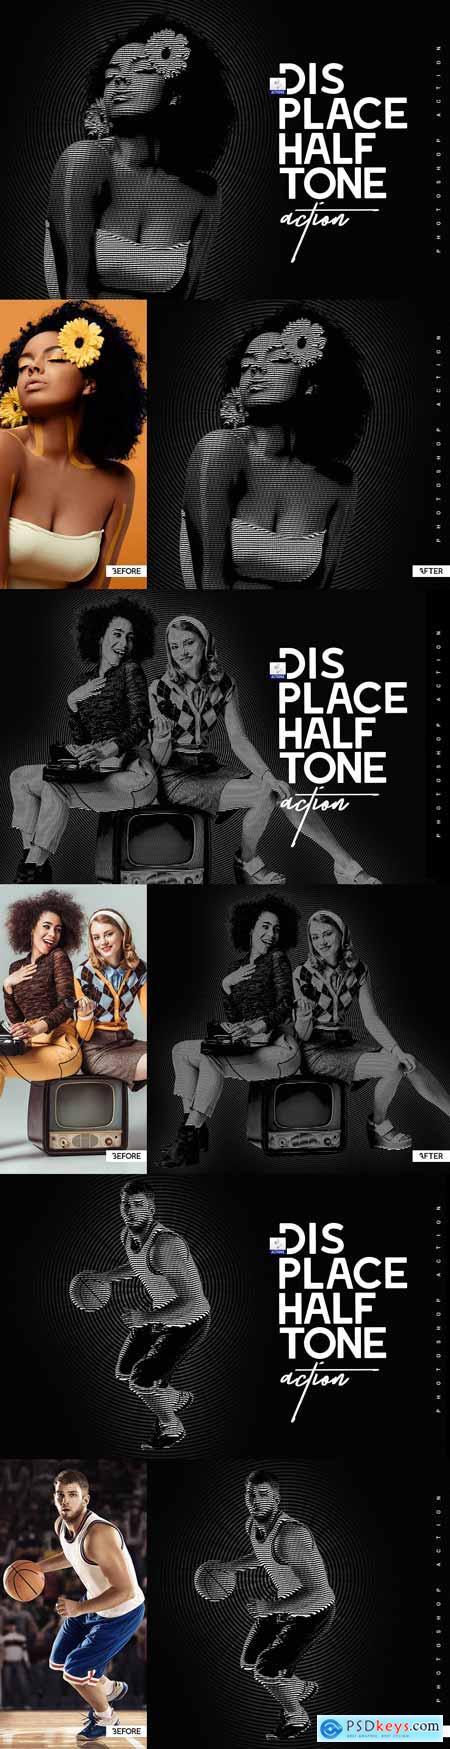 Displace Halftone 3304747